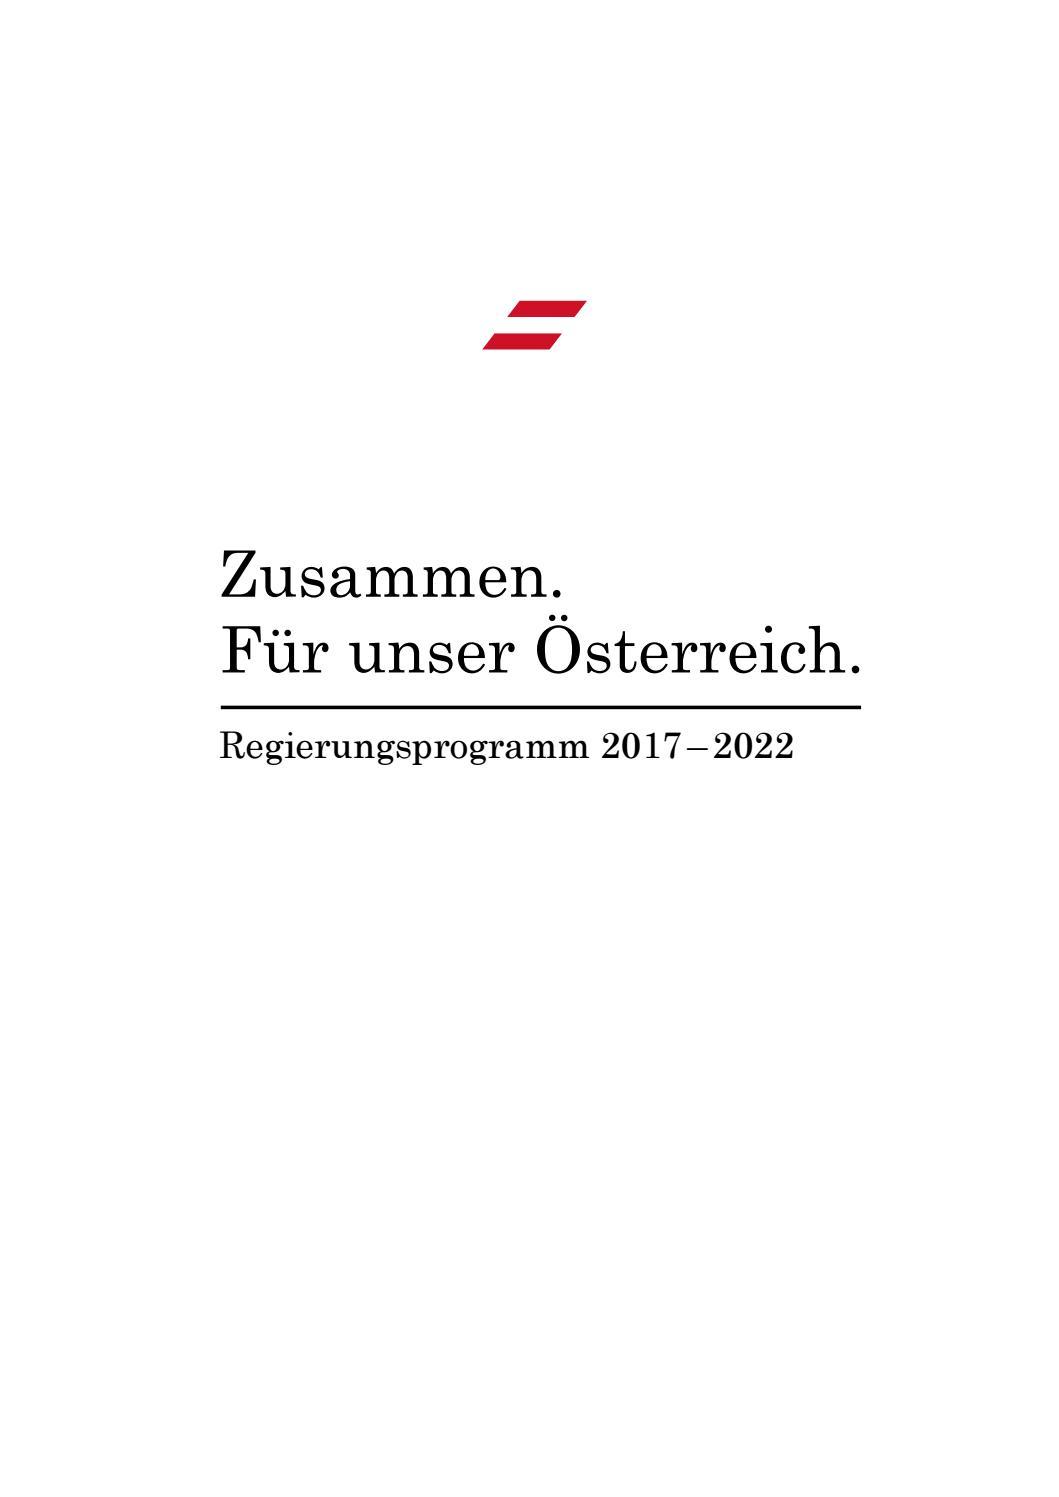 Regierungsprogramm by Sebastian Kurz - issuu